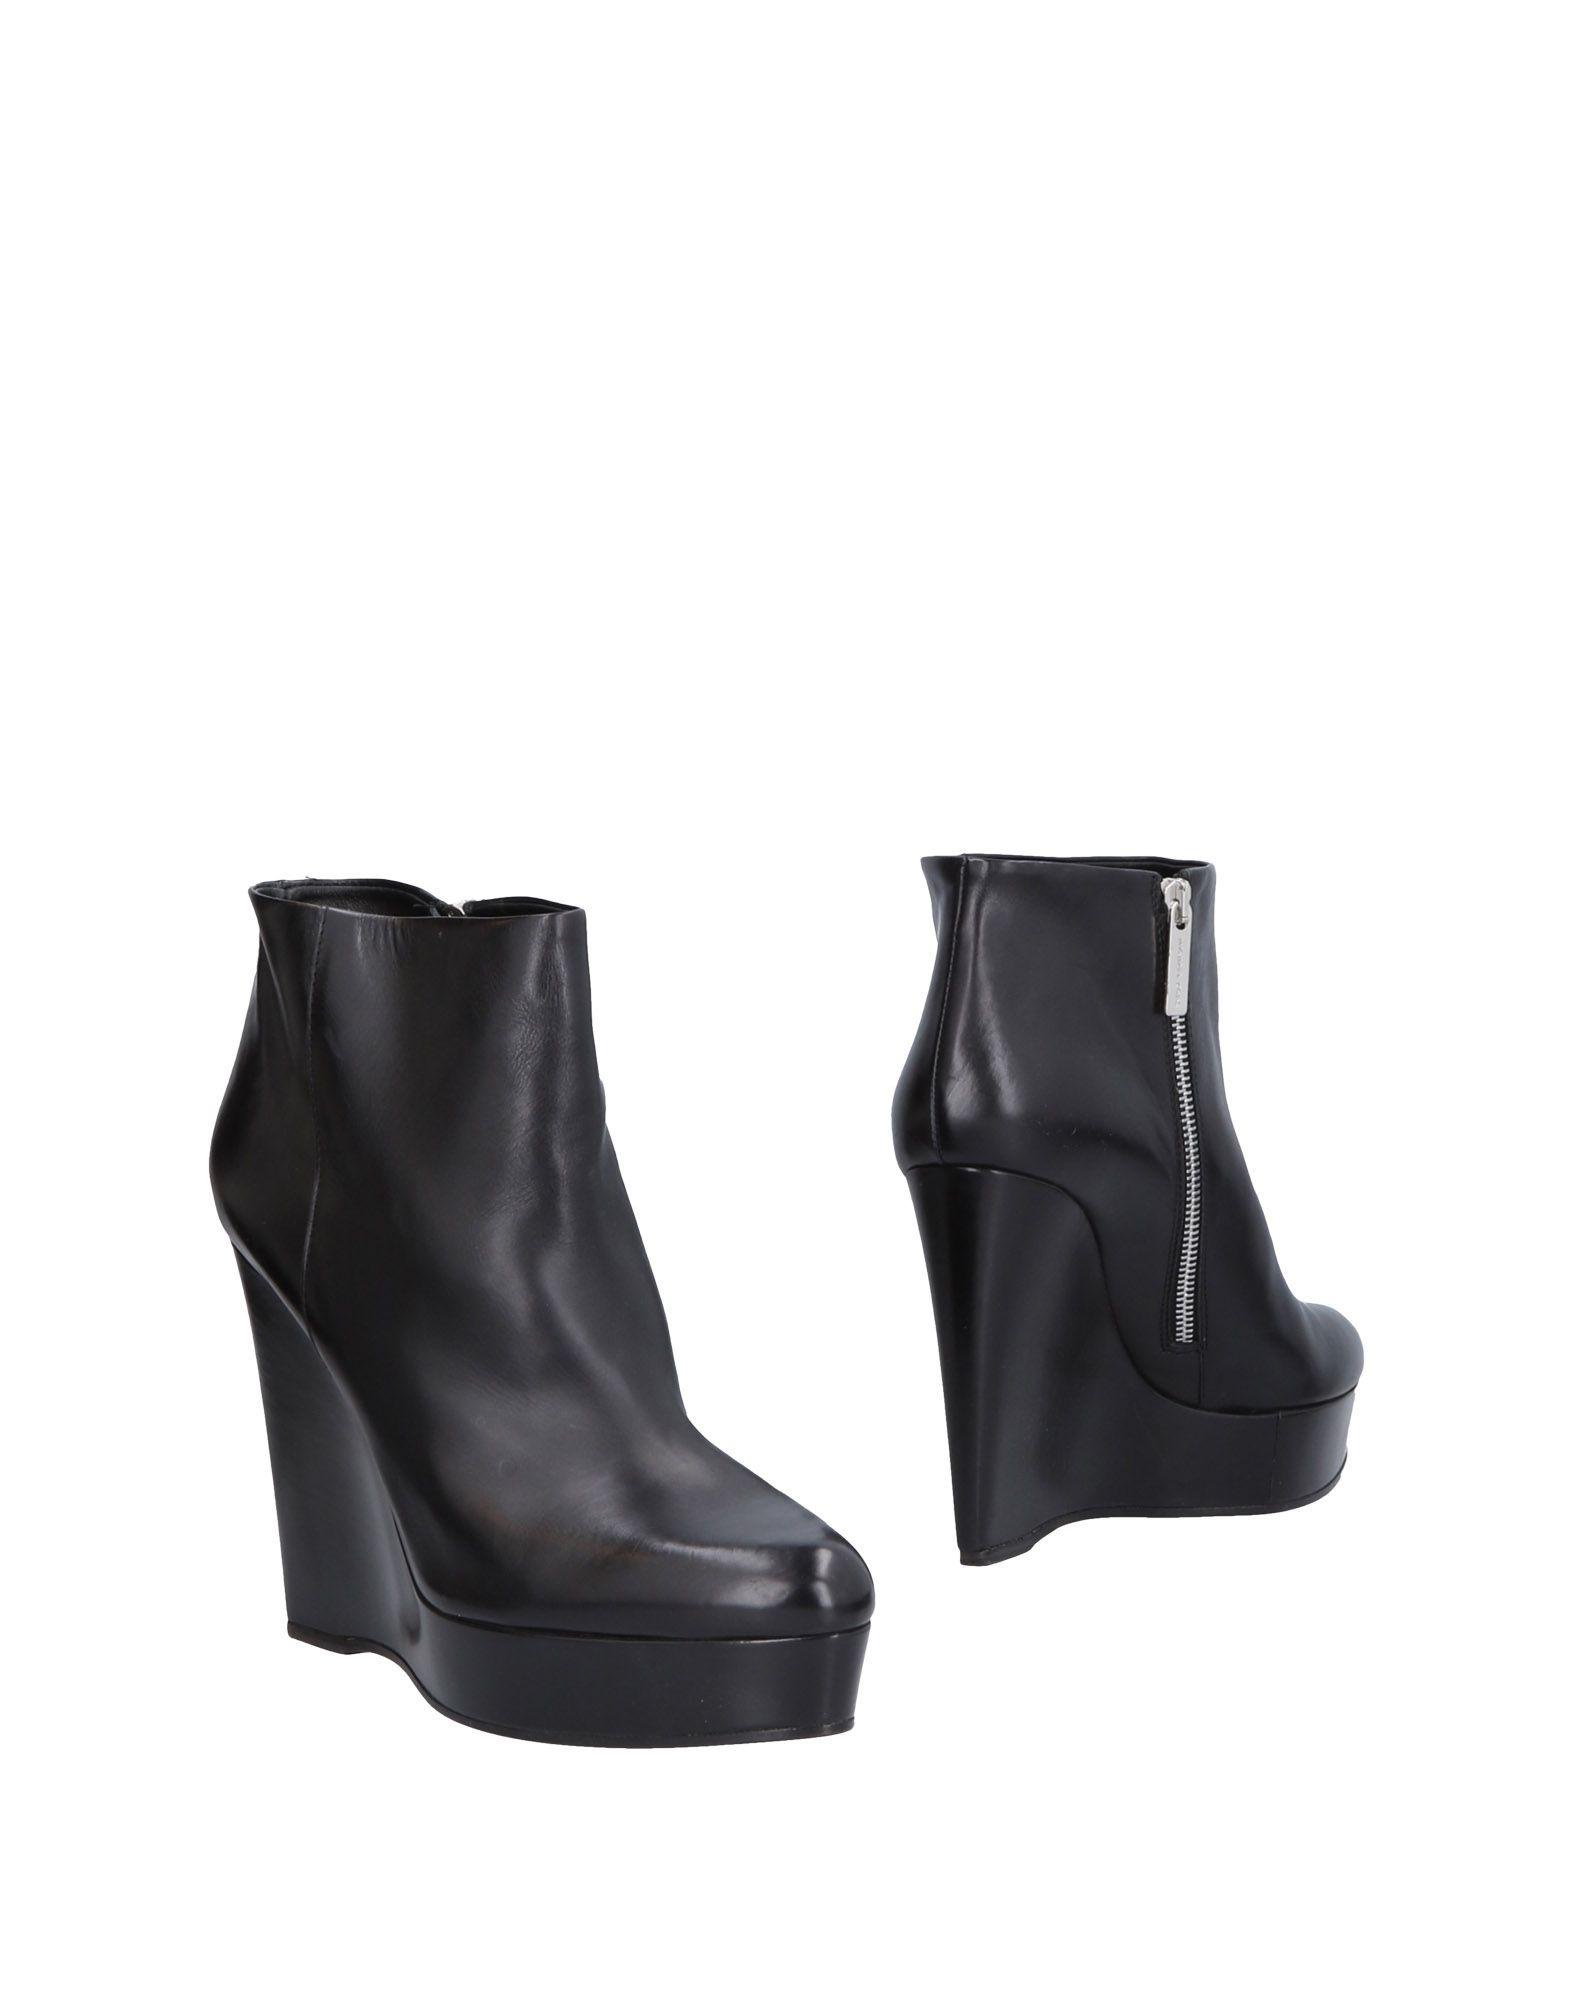 MICHAEL KORS Полусапоги и высокие ботинки ботинки michael michael kors 40f7cdmb9l 001 black